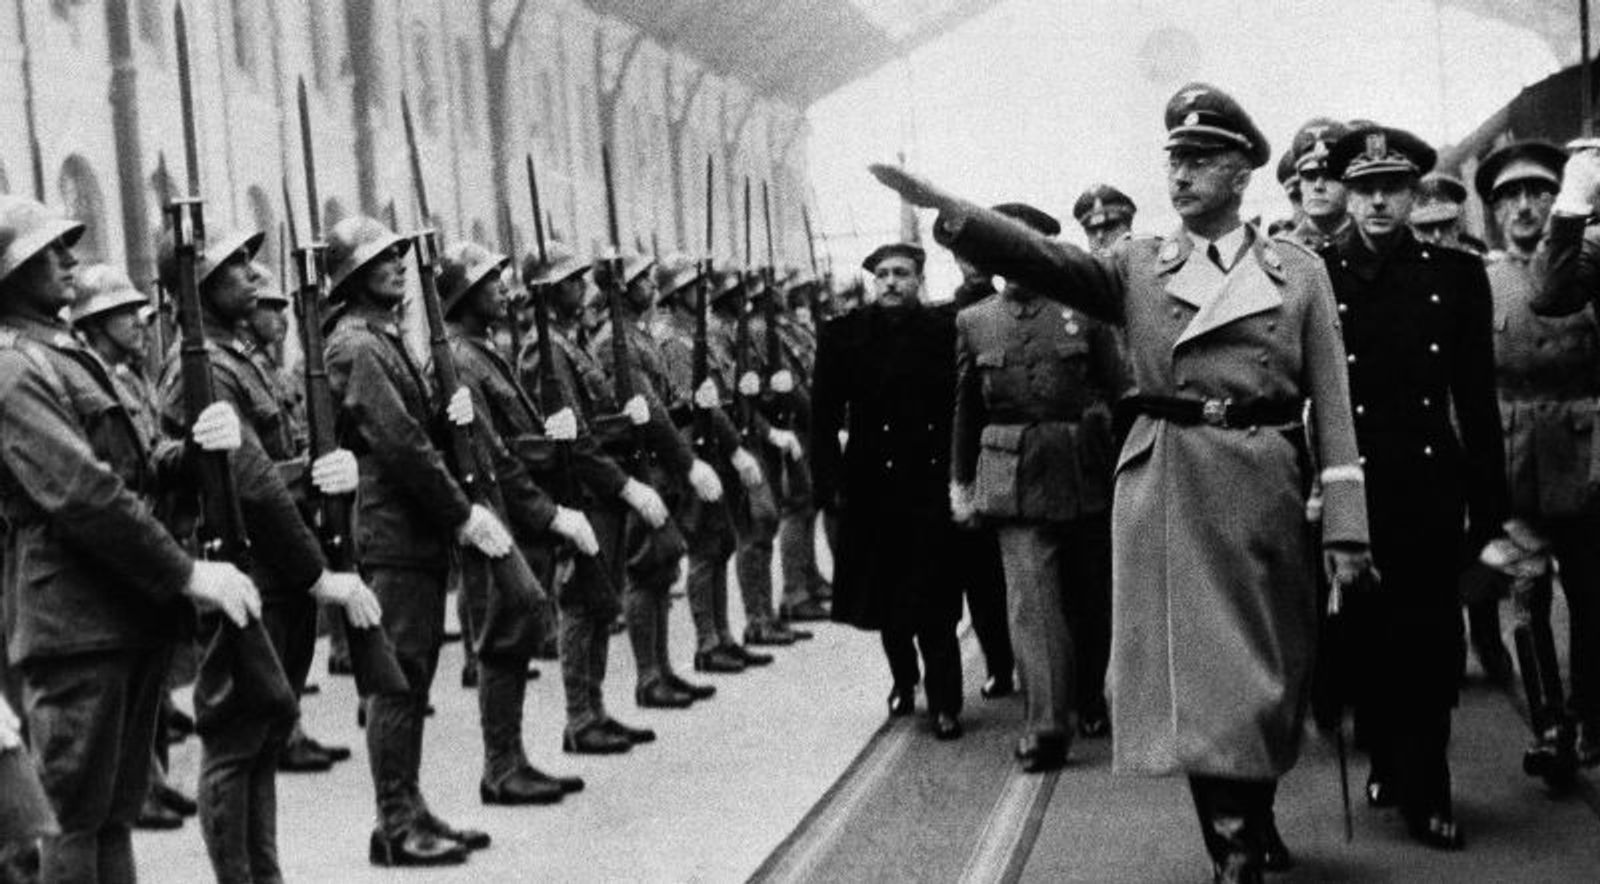 España en la Segunda Guerra Mundial cover image